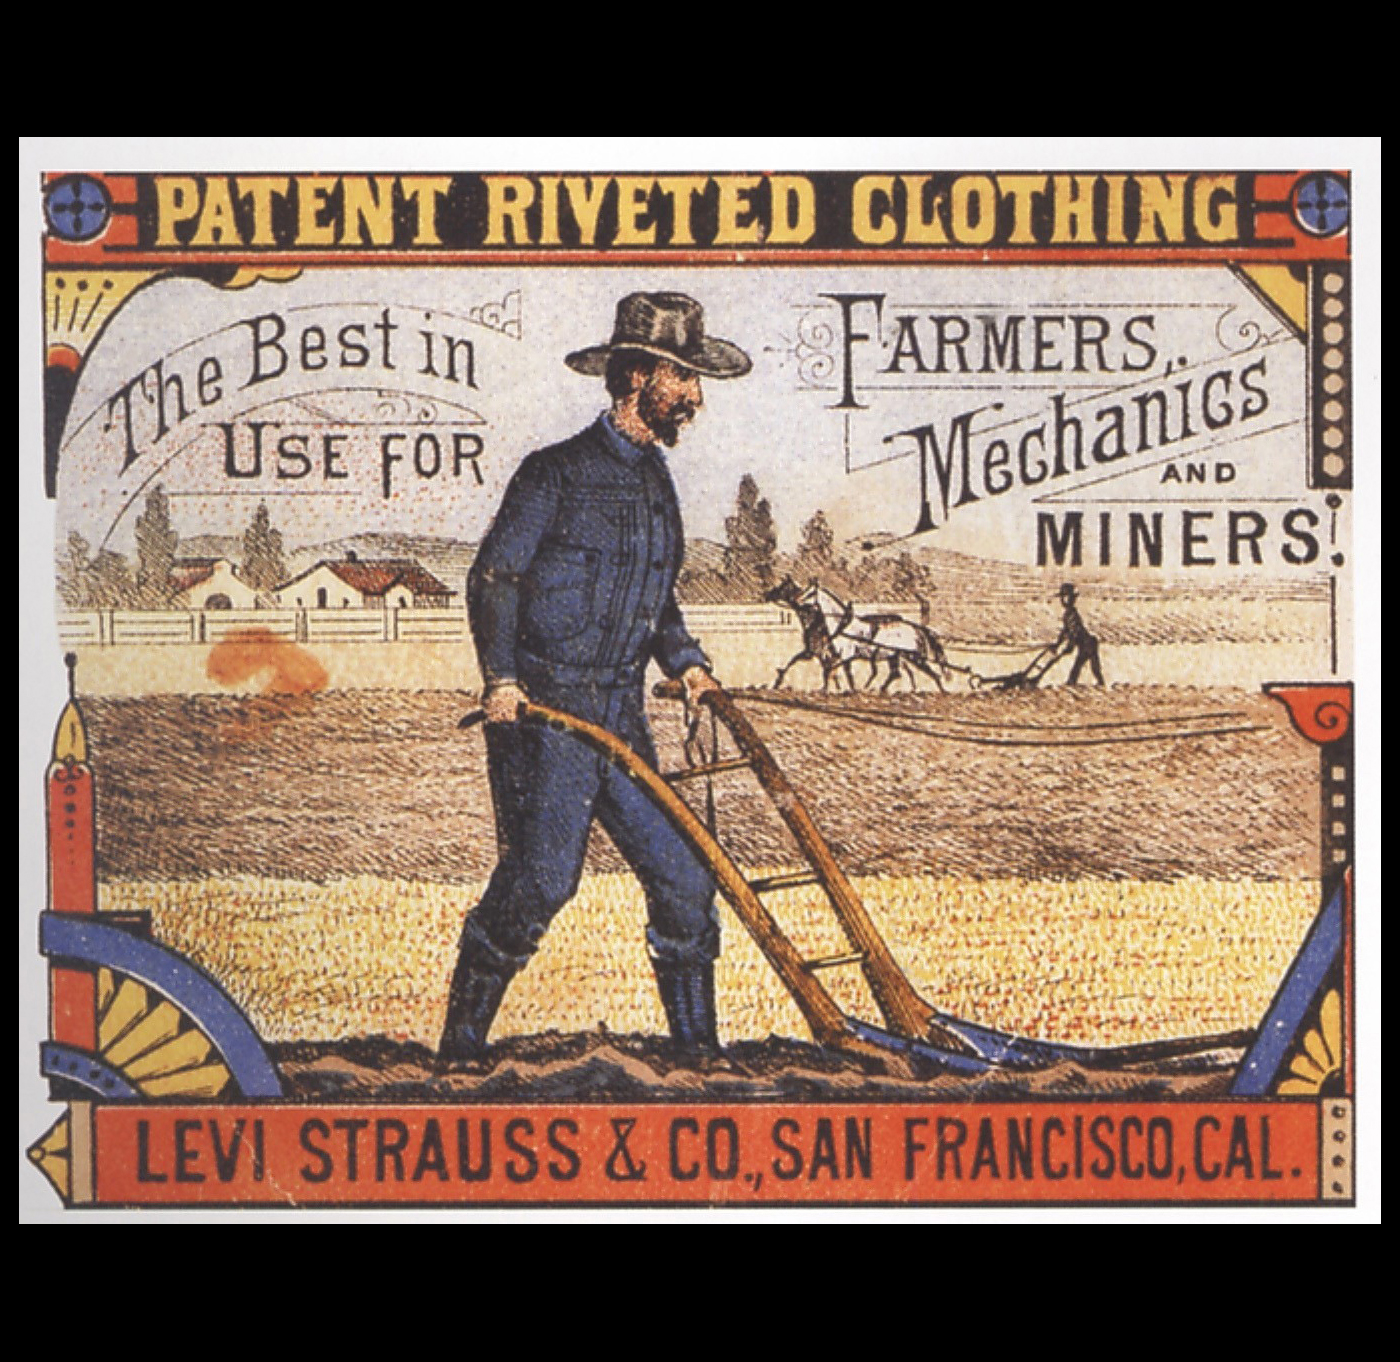 The 1880s: Levis original USA jeans were still a novelty.